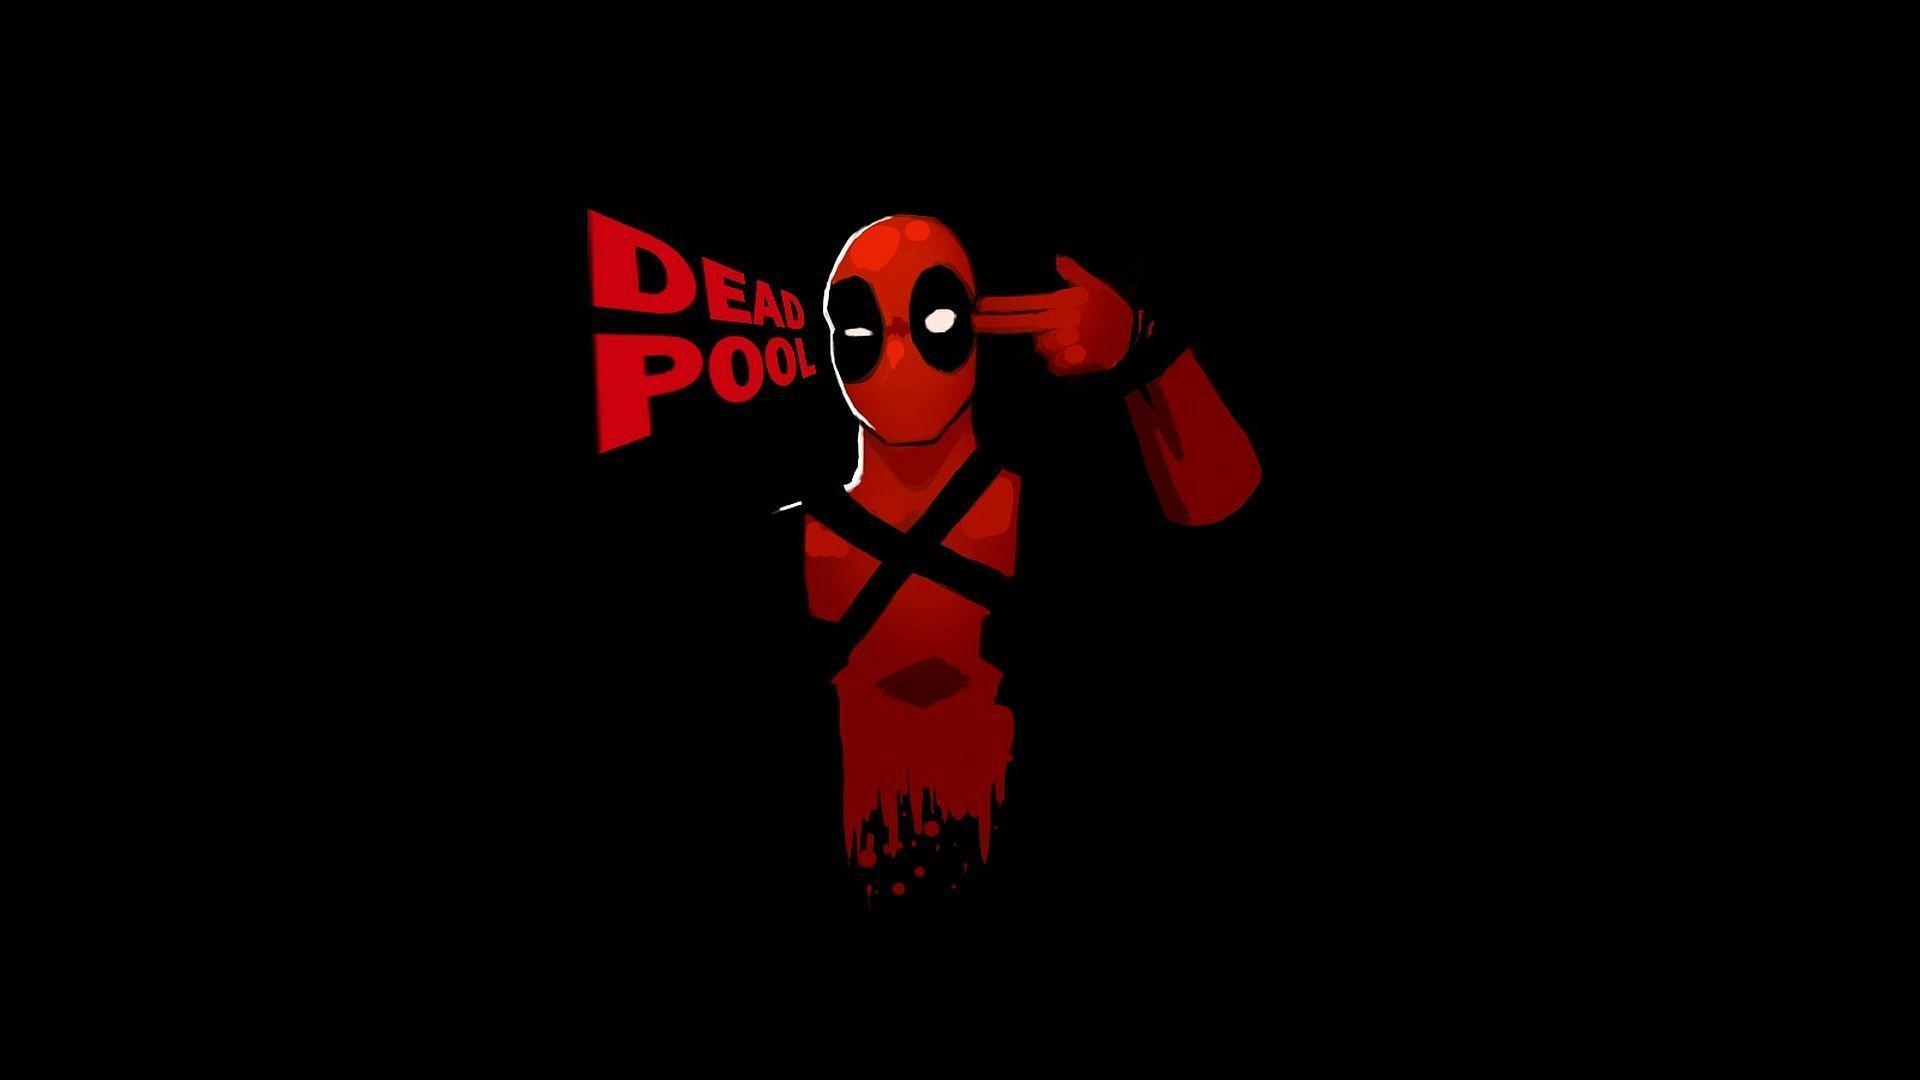 Chibi Deadpool Computer Wallpapers Top Free Chibi Deadpool Computer Backgrounds Wallpaperaccess